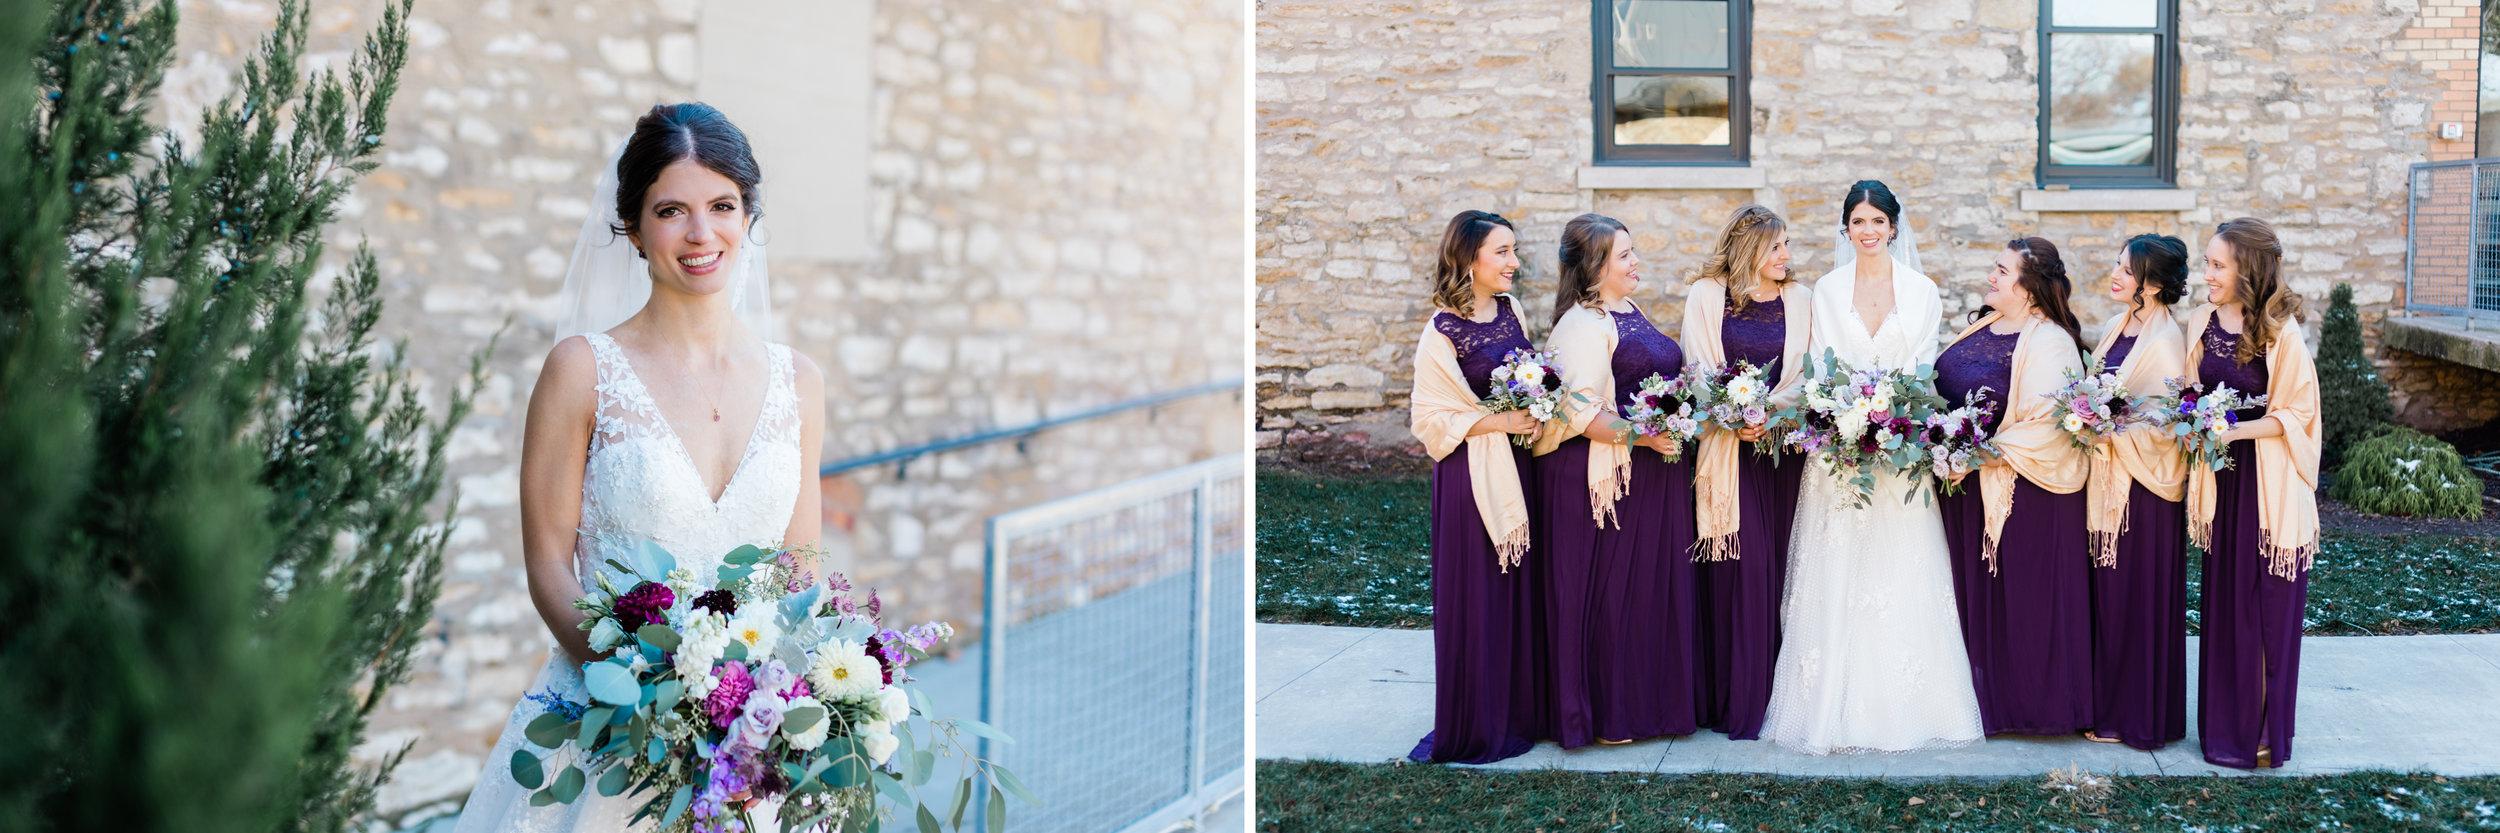 Lawrence Kansas Wedding Cider Gallery Bridesmaids.jpg